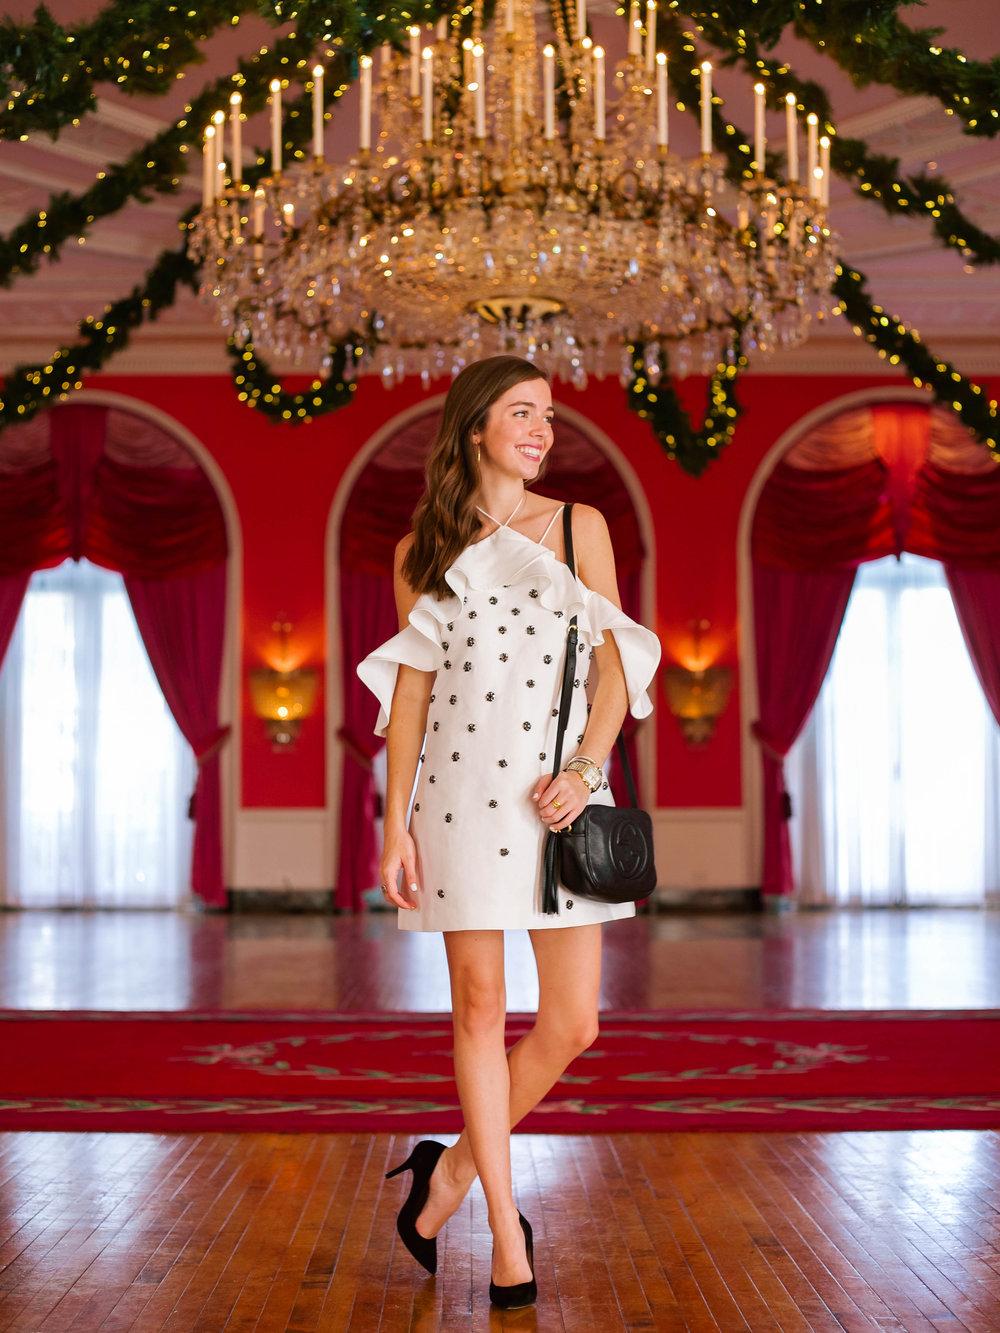 fashion blogger lcb style greenbrier resort (5 of 10).jpg